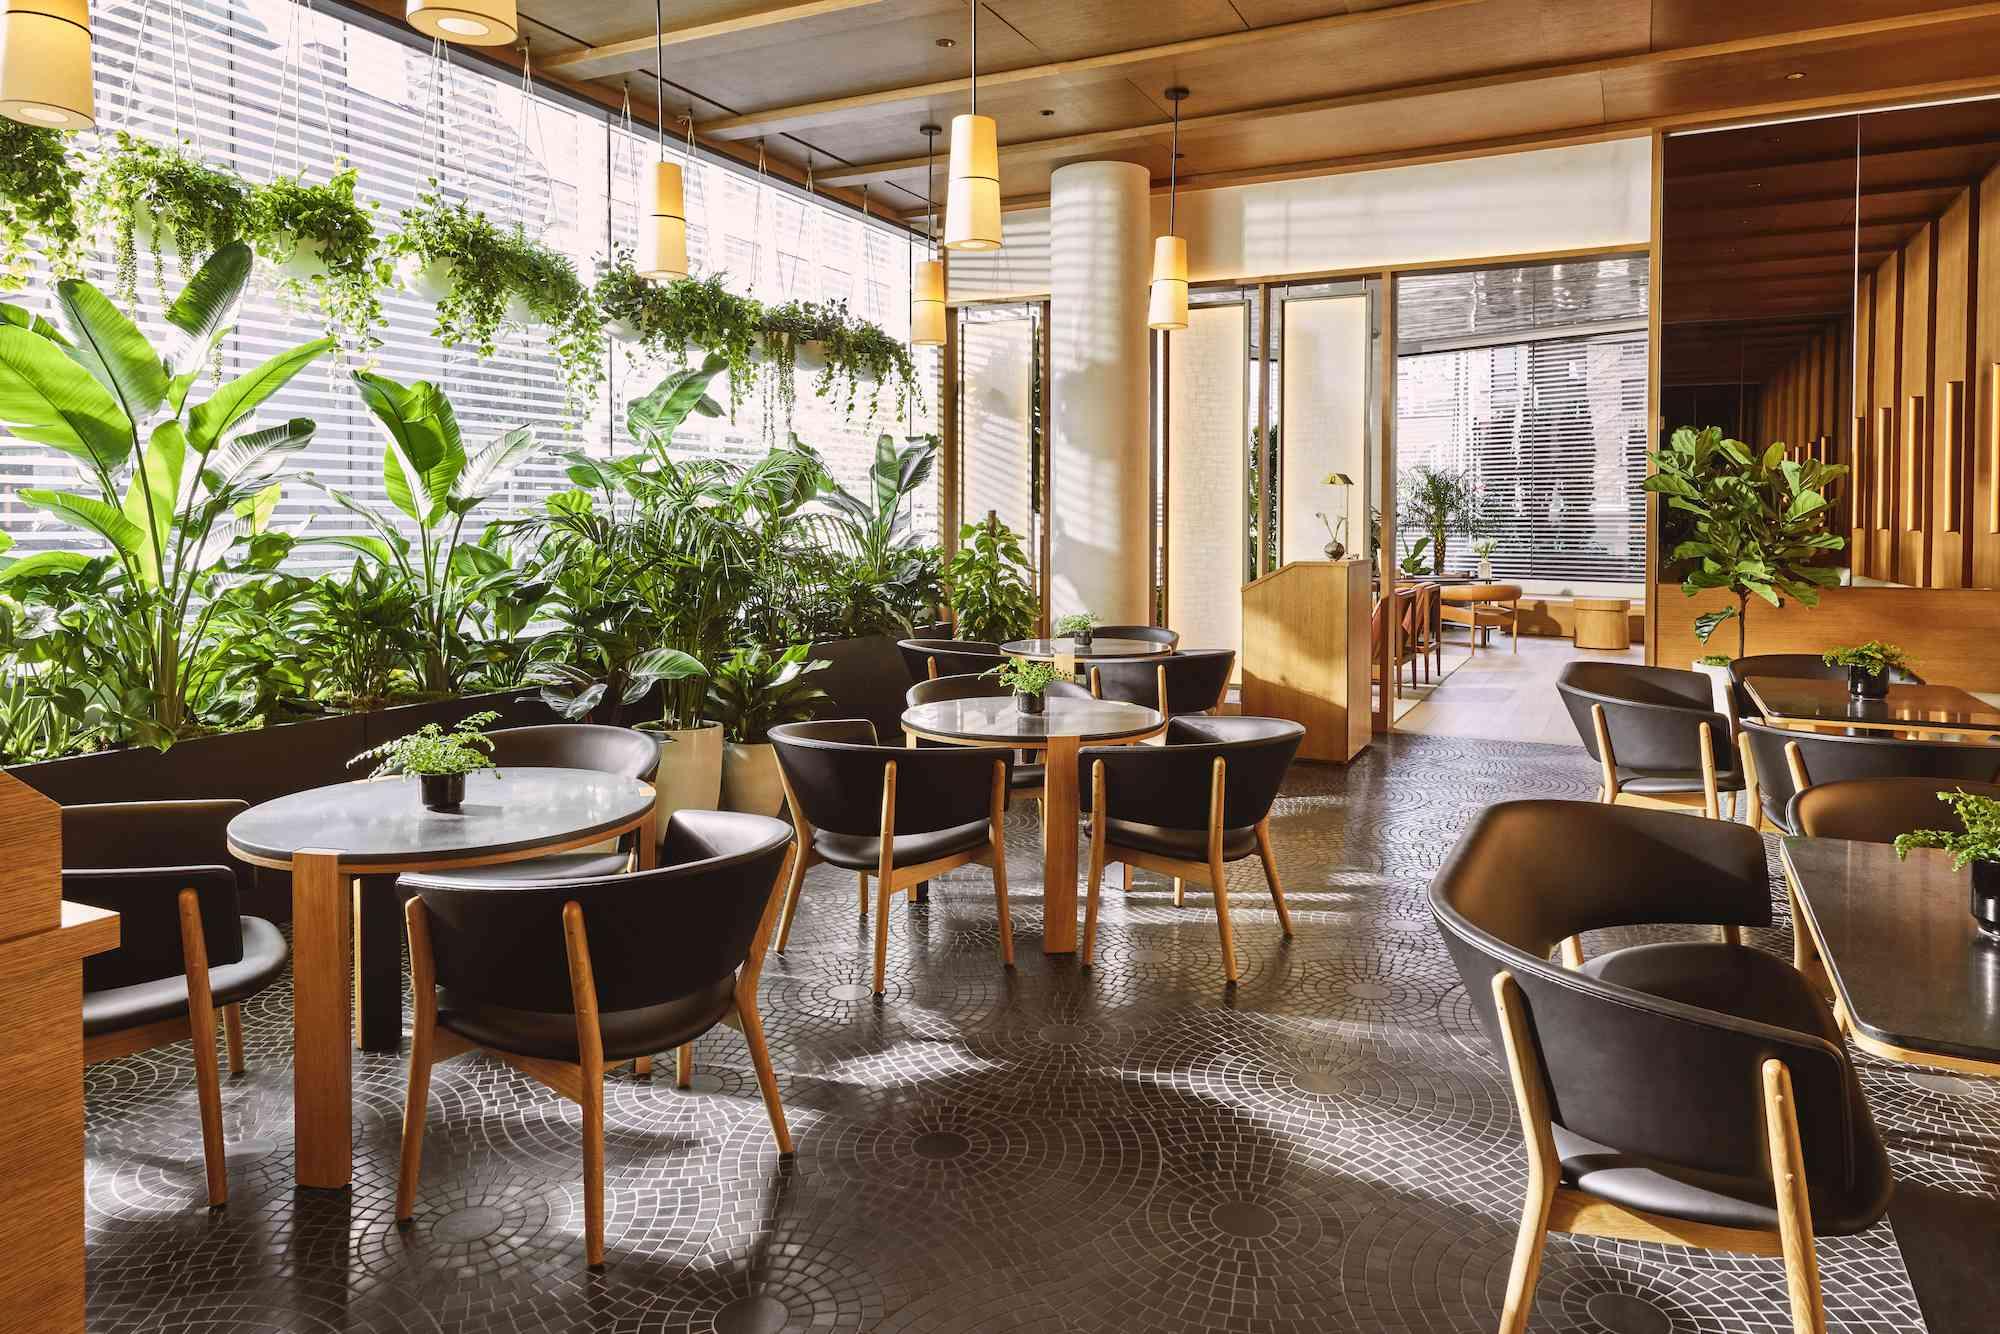 Pendry Manhattan West Garden Room